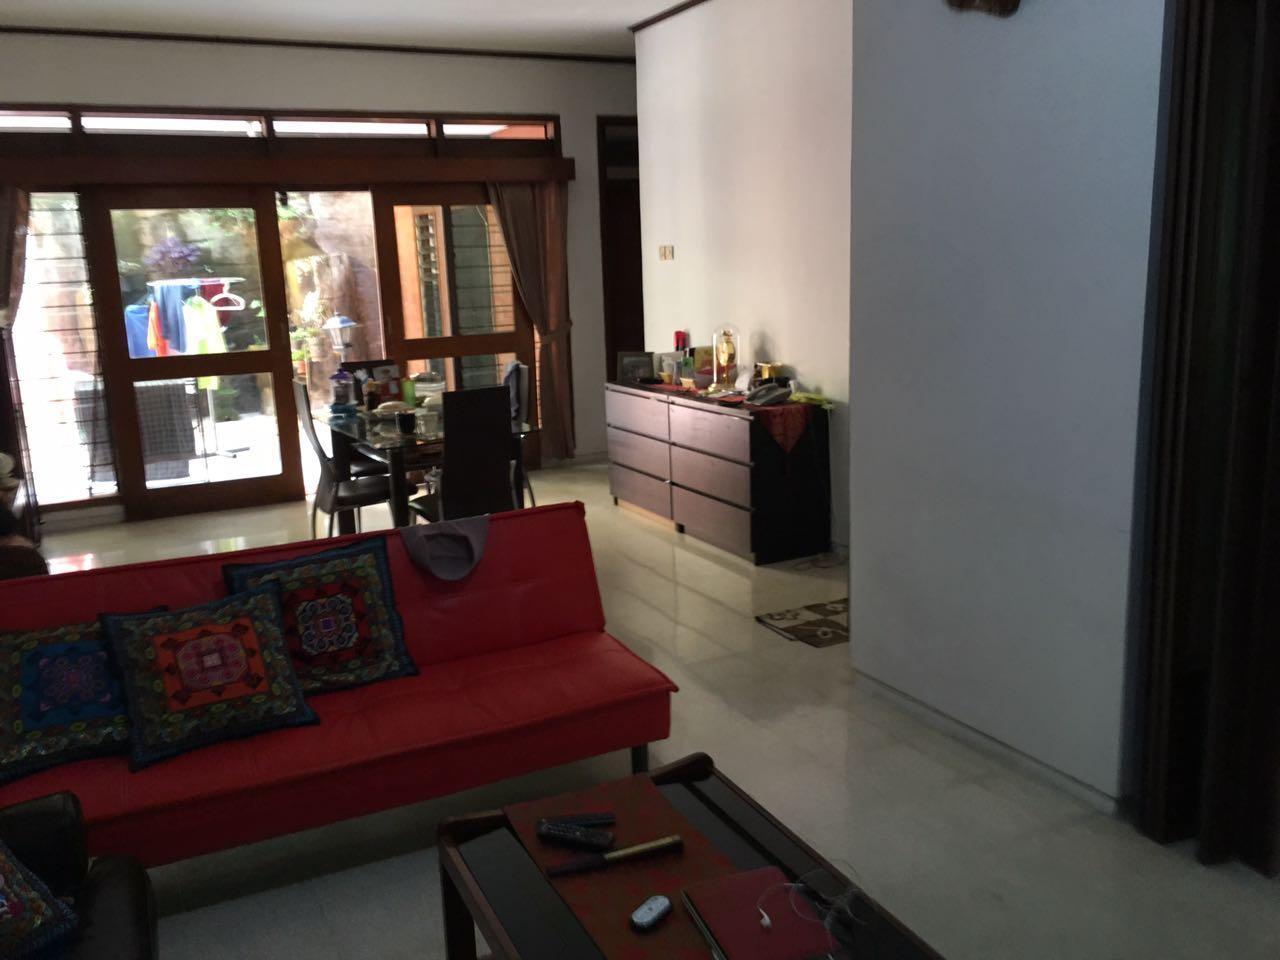 Di jual rumah Jl sambas lokasi strategis dekat MRT dan Blok M kebayoran baru Jakarta Selatan